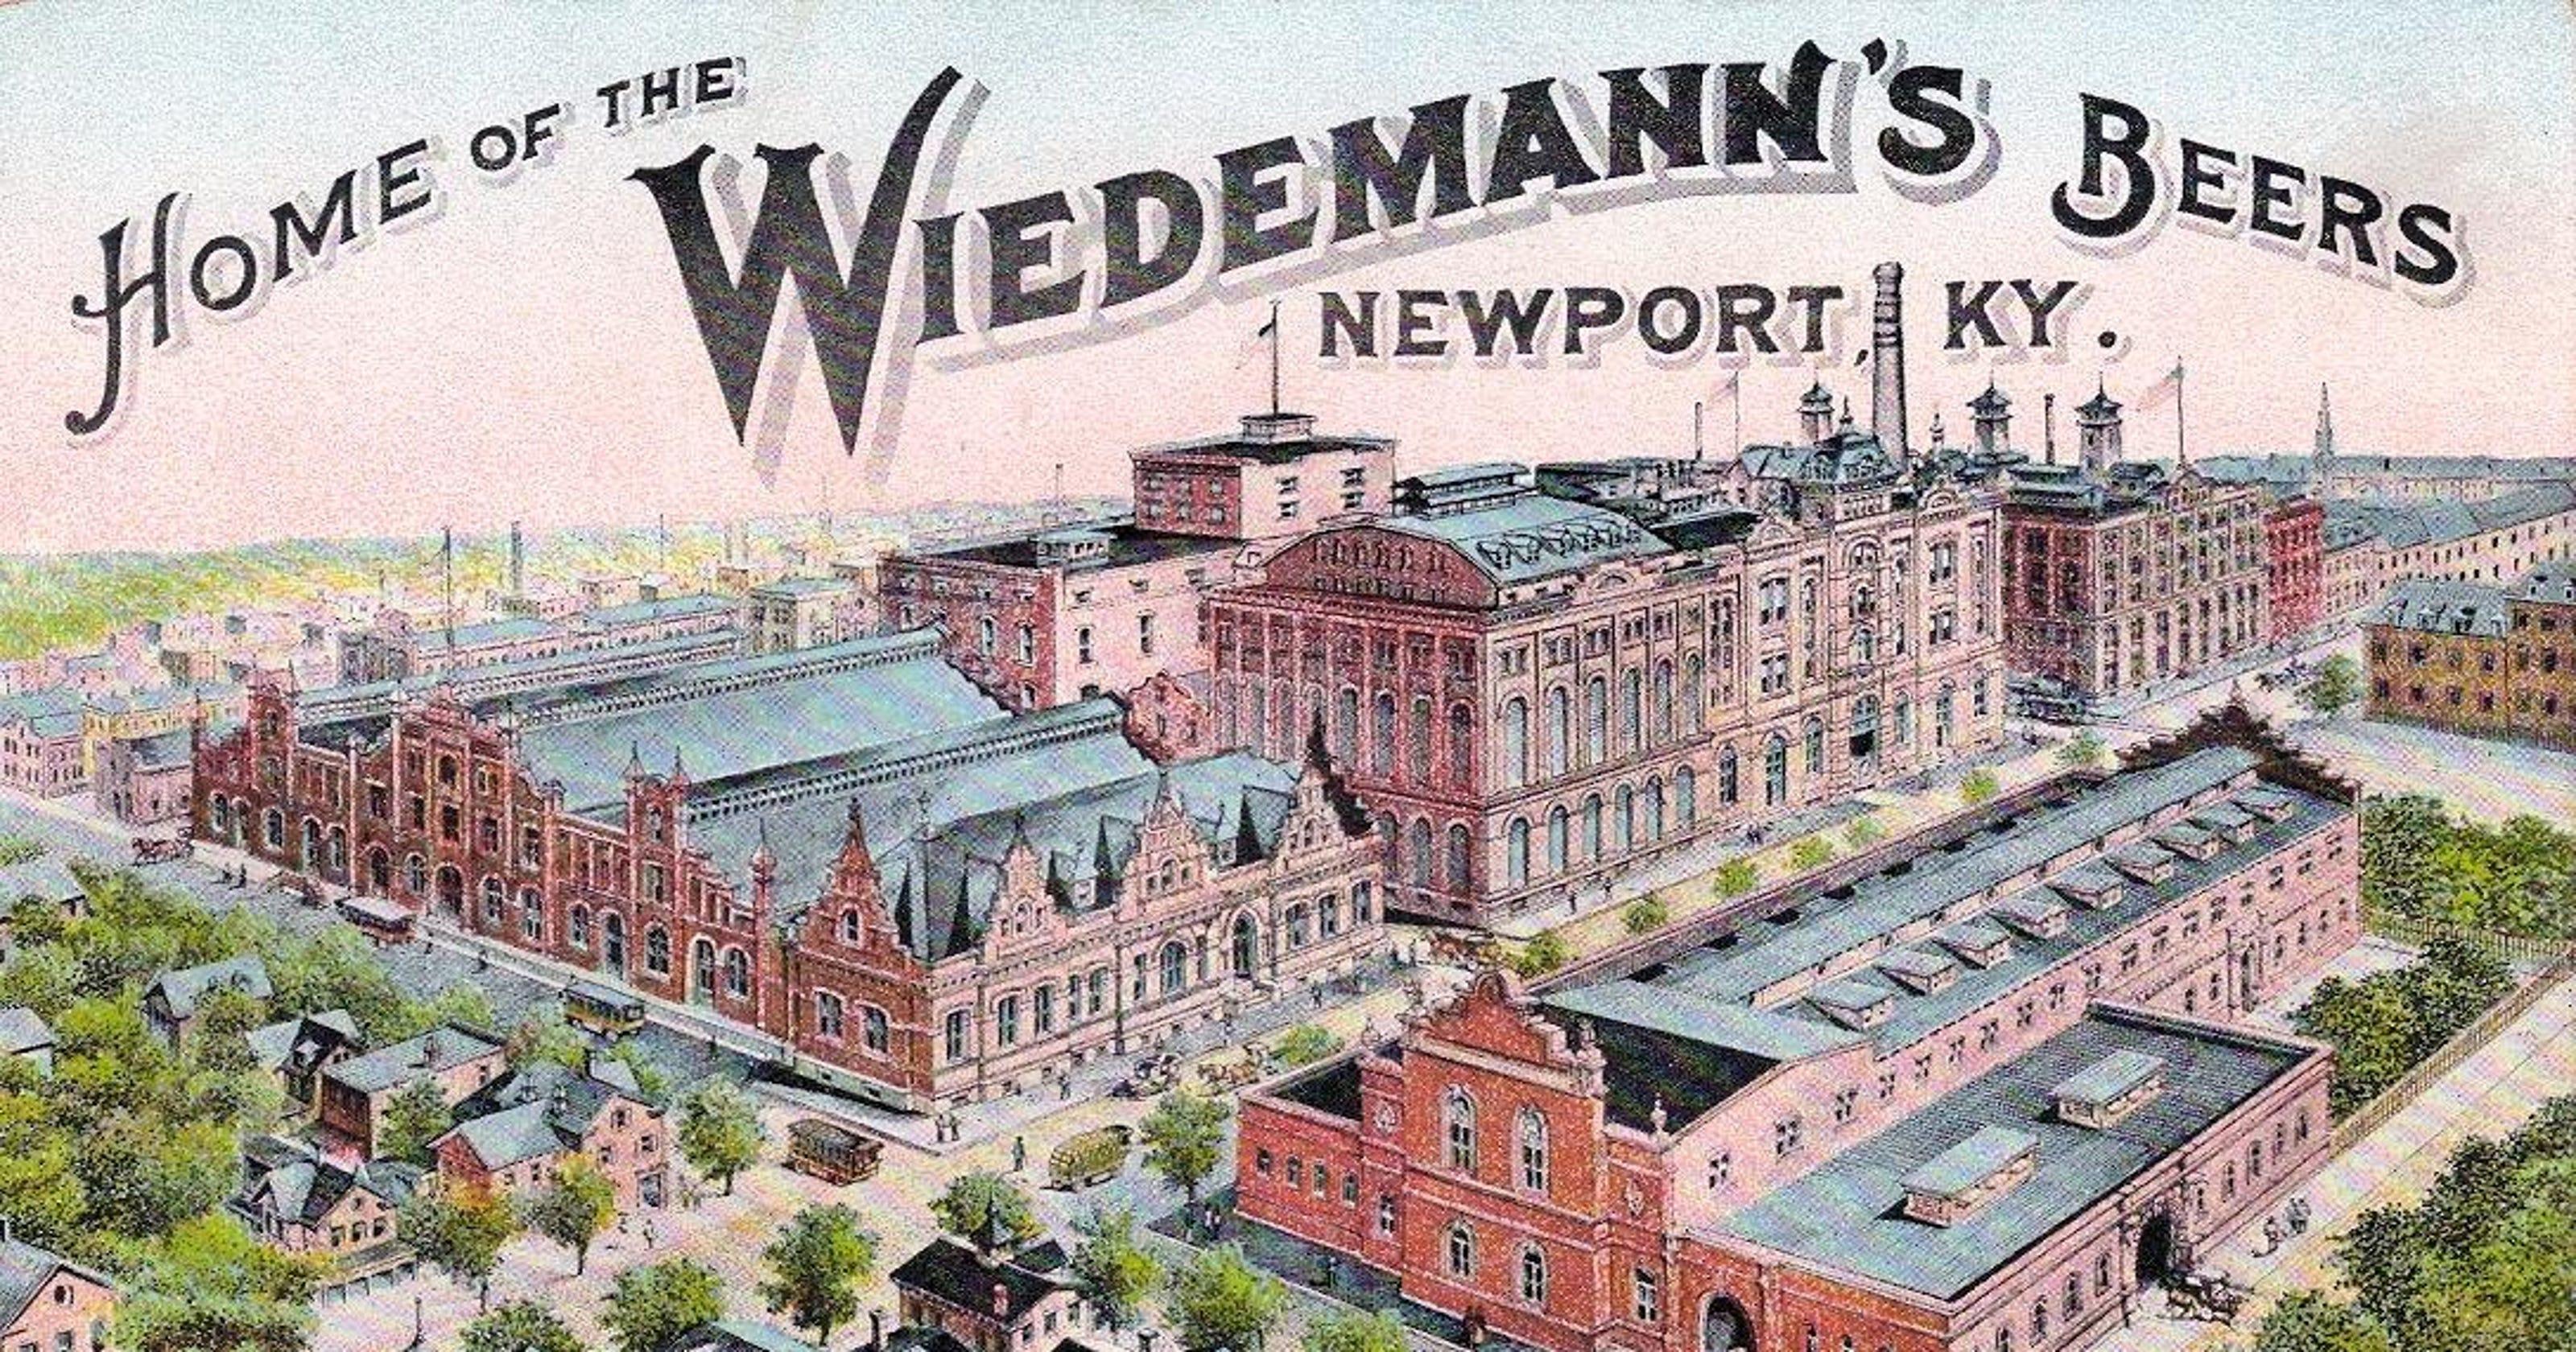 Wiedemann Brewery Iconic Brand Back With Beer Garden